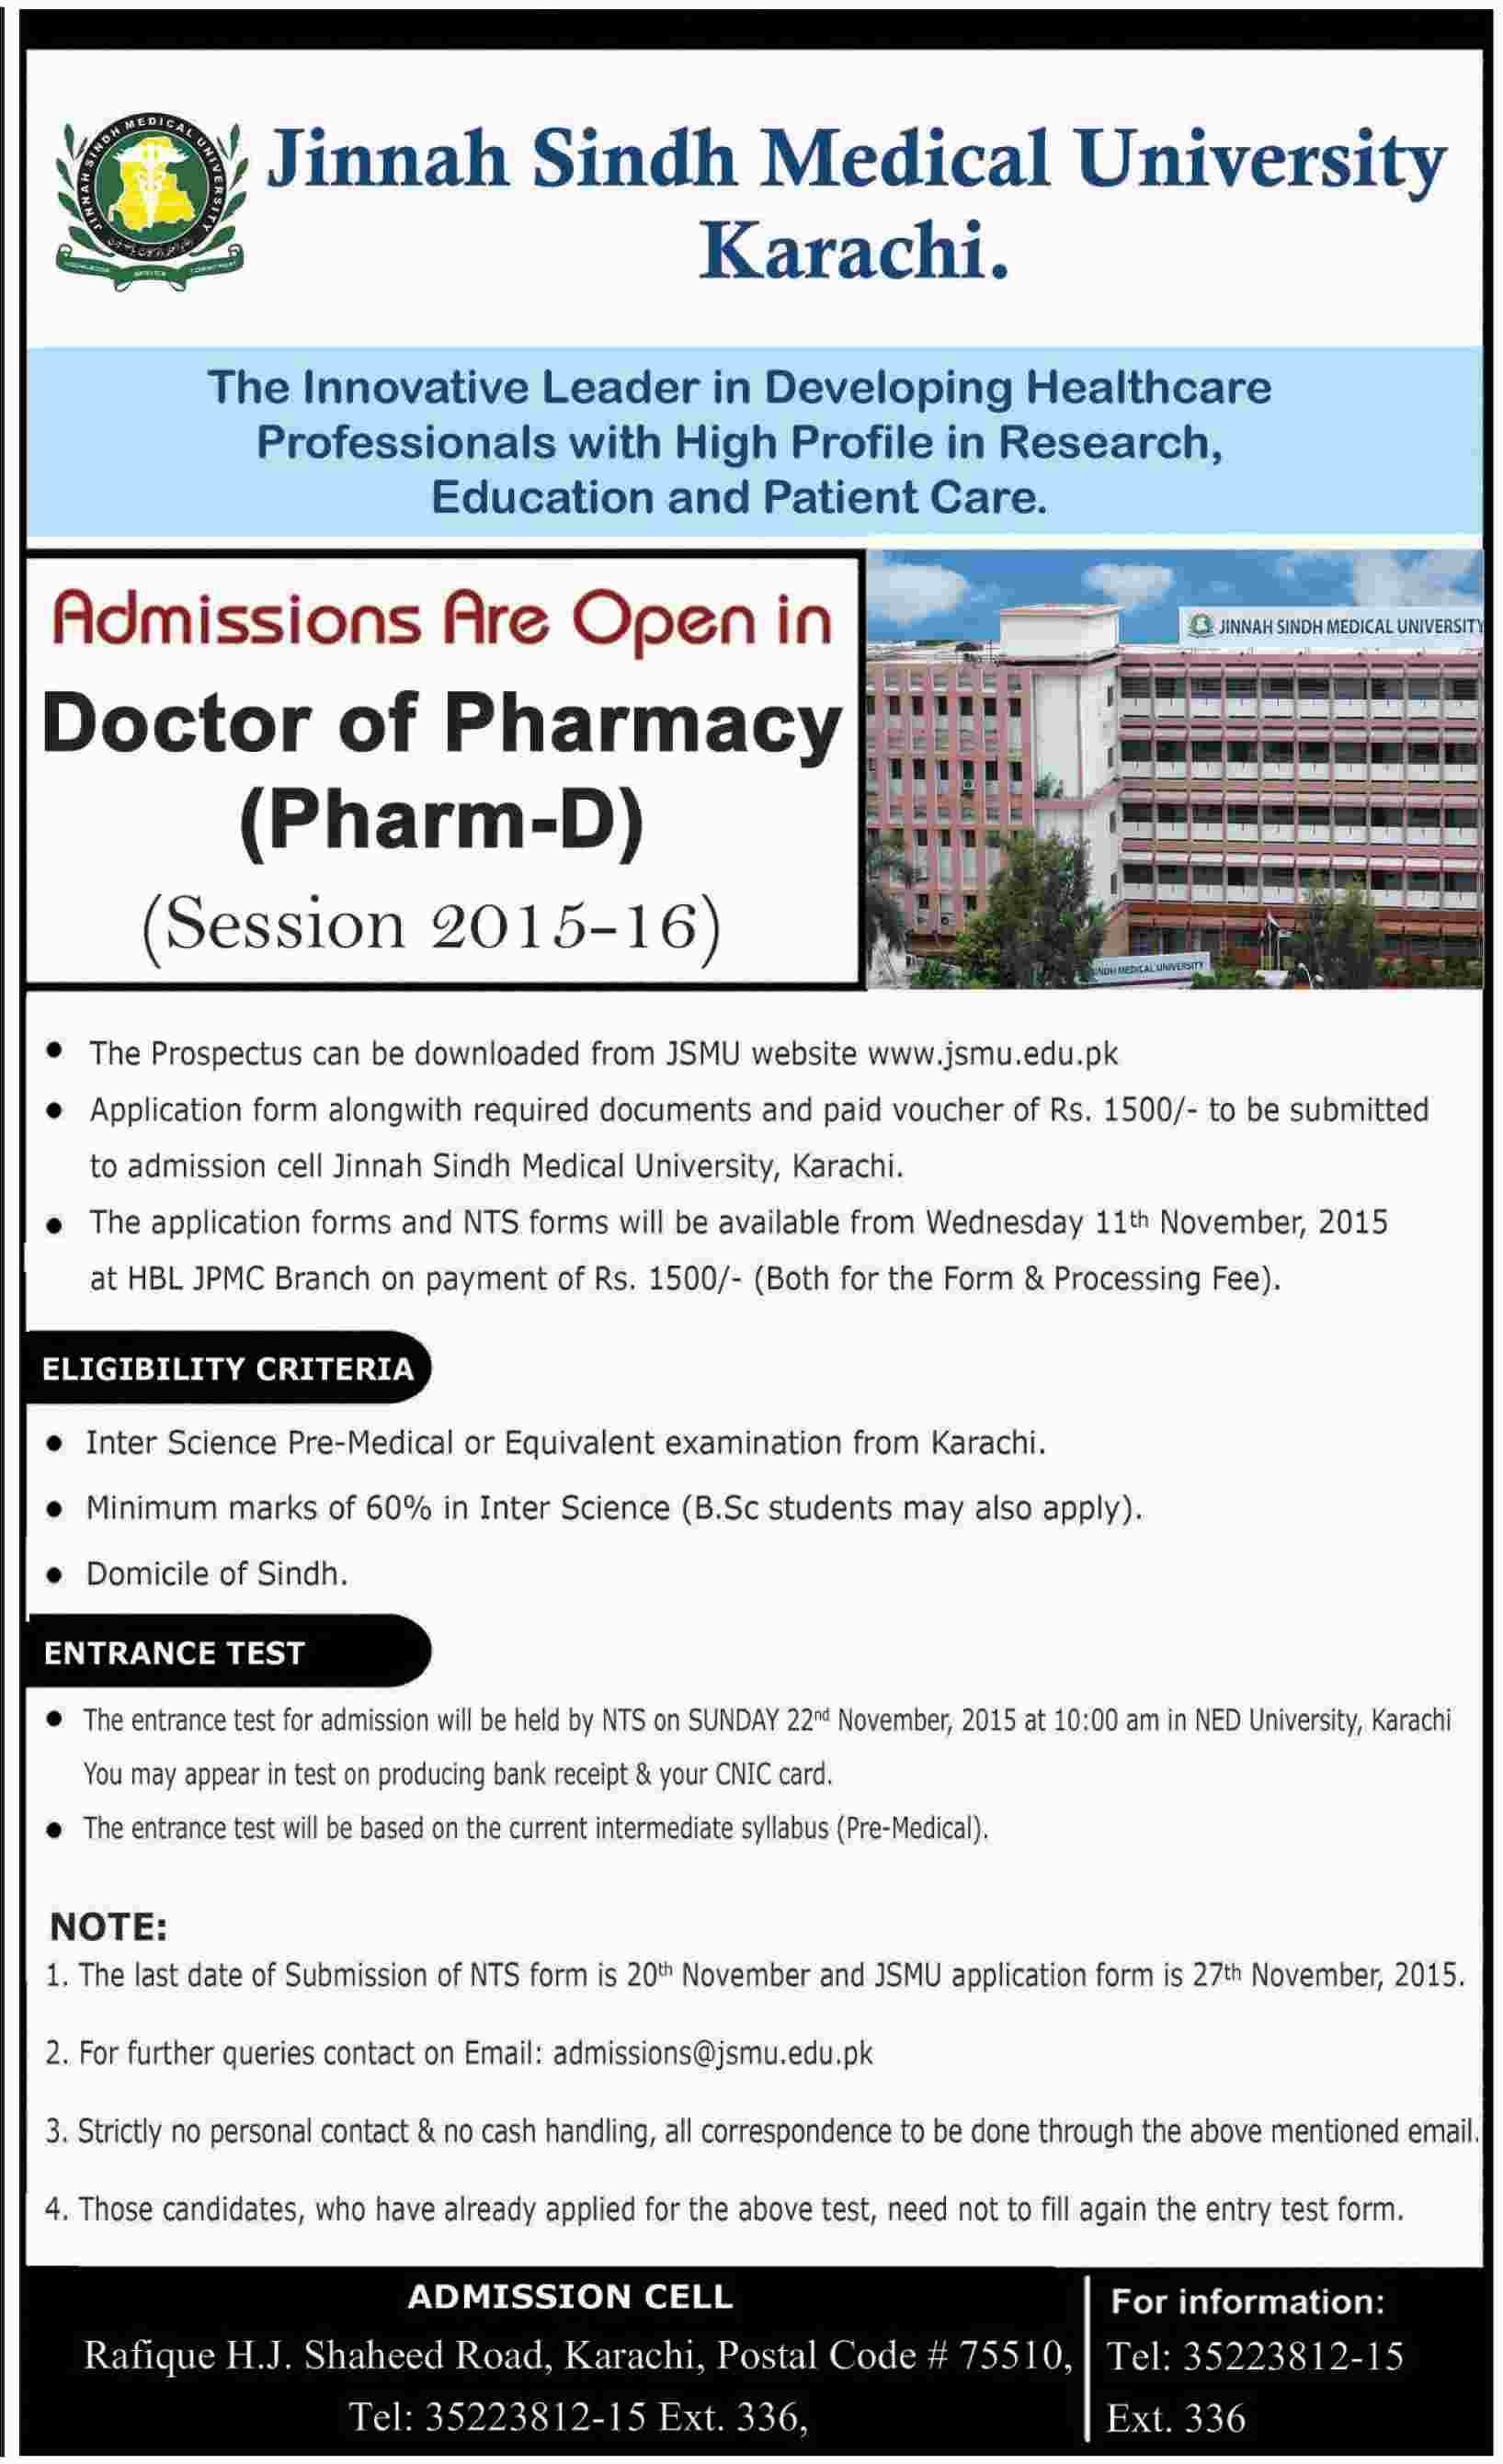 Jinnah Sindh Medical University Pharm D Admissions 2016-2017 JSMU Entry Test